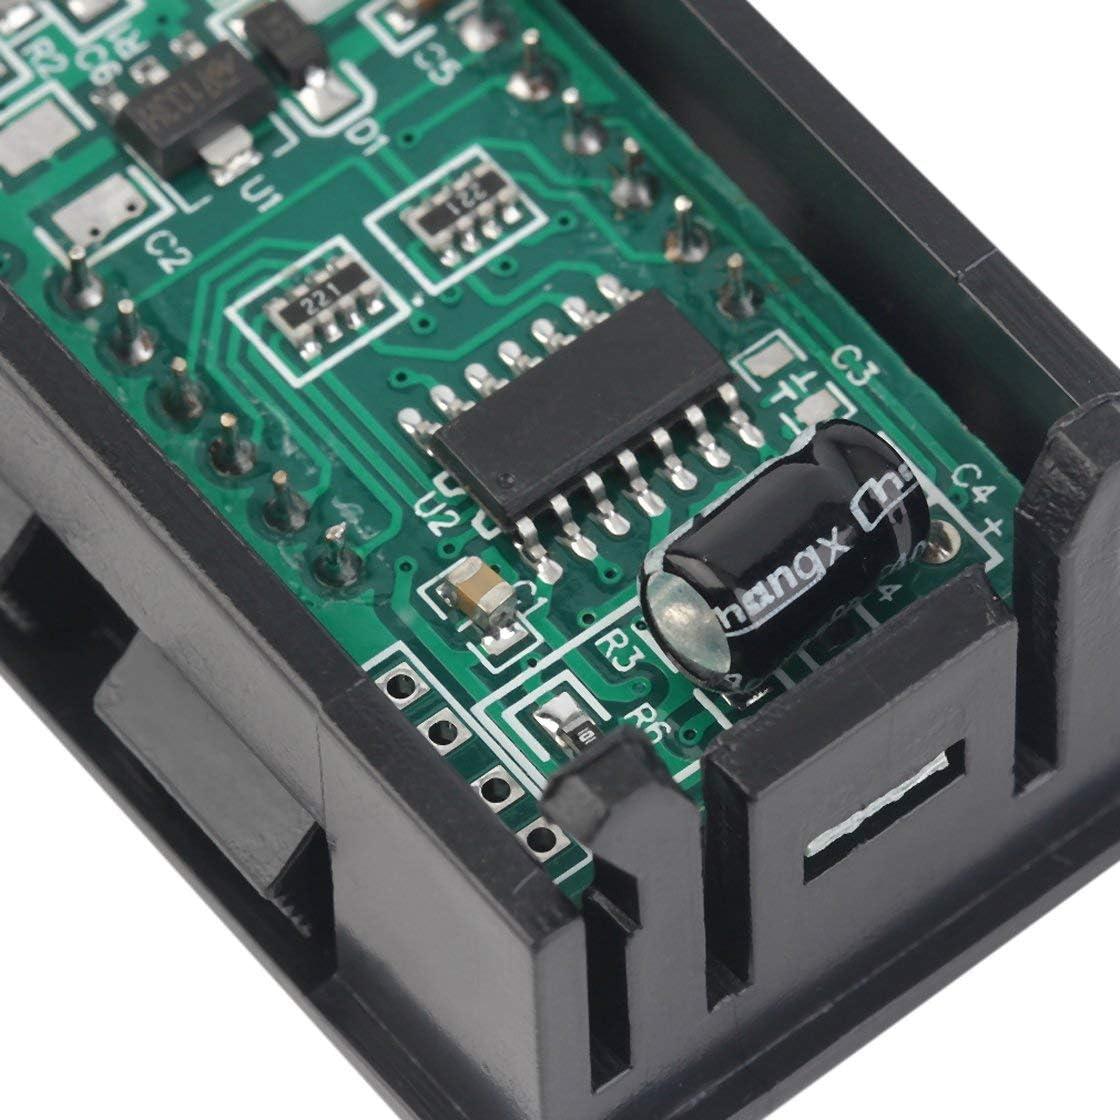 10 st/ücke Led-anzeige Hohe Messgenauigkeit Mini Digital Voltmeter 0-100 V Rote LED Fahrzeuge Motor Spannung Panel Meter